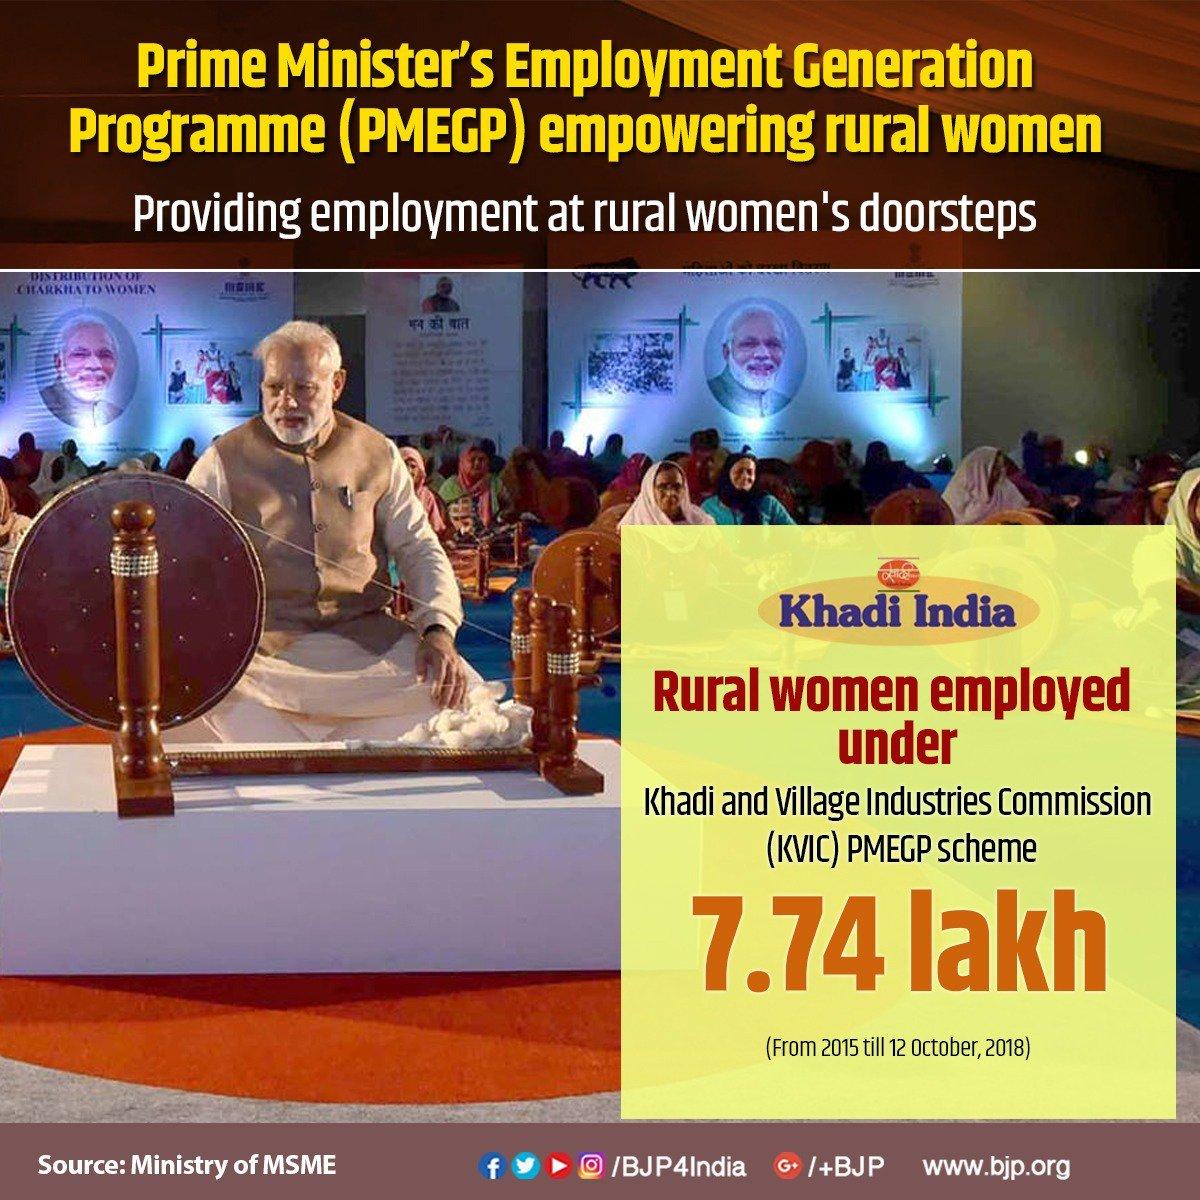 Modi government is providing employment at rural women's doorsteps, 7.74 lakh rural women employed under Khadi and Village Industries Commission's (KVIC) PMEGP Scheme.